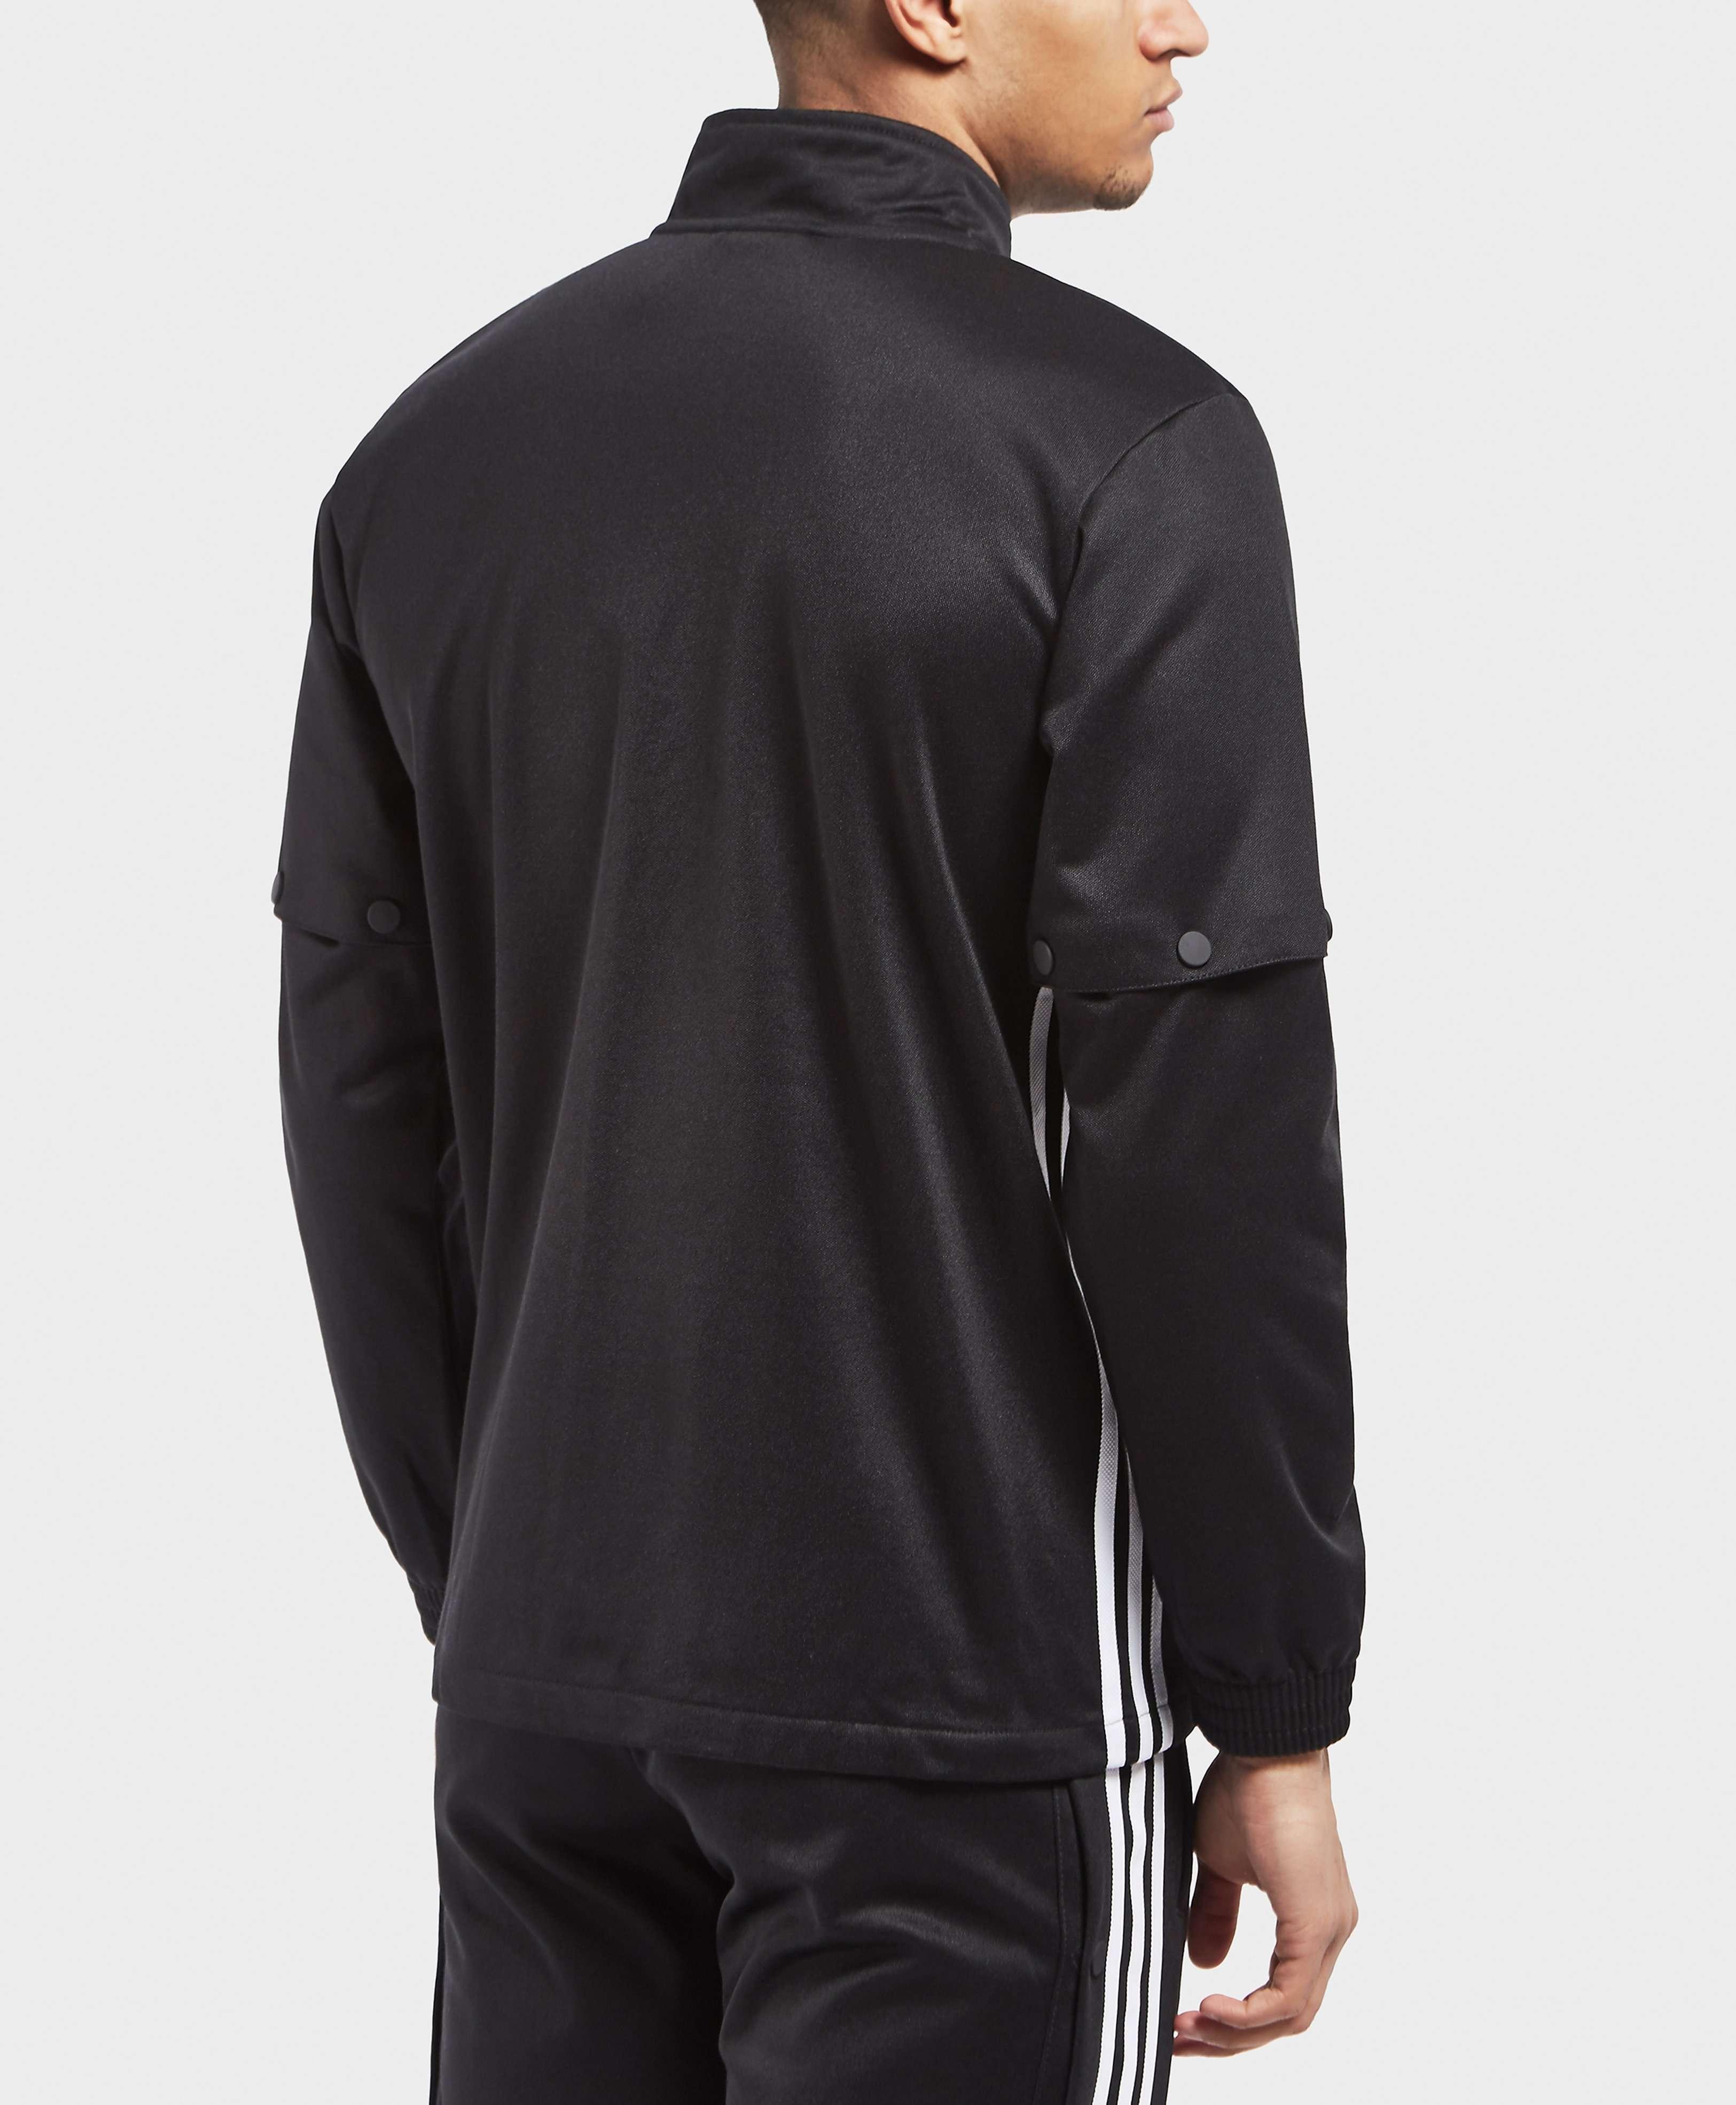 Adidas Originals Trefoil Snap Track Top Scotts Menswear